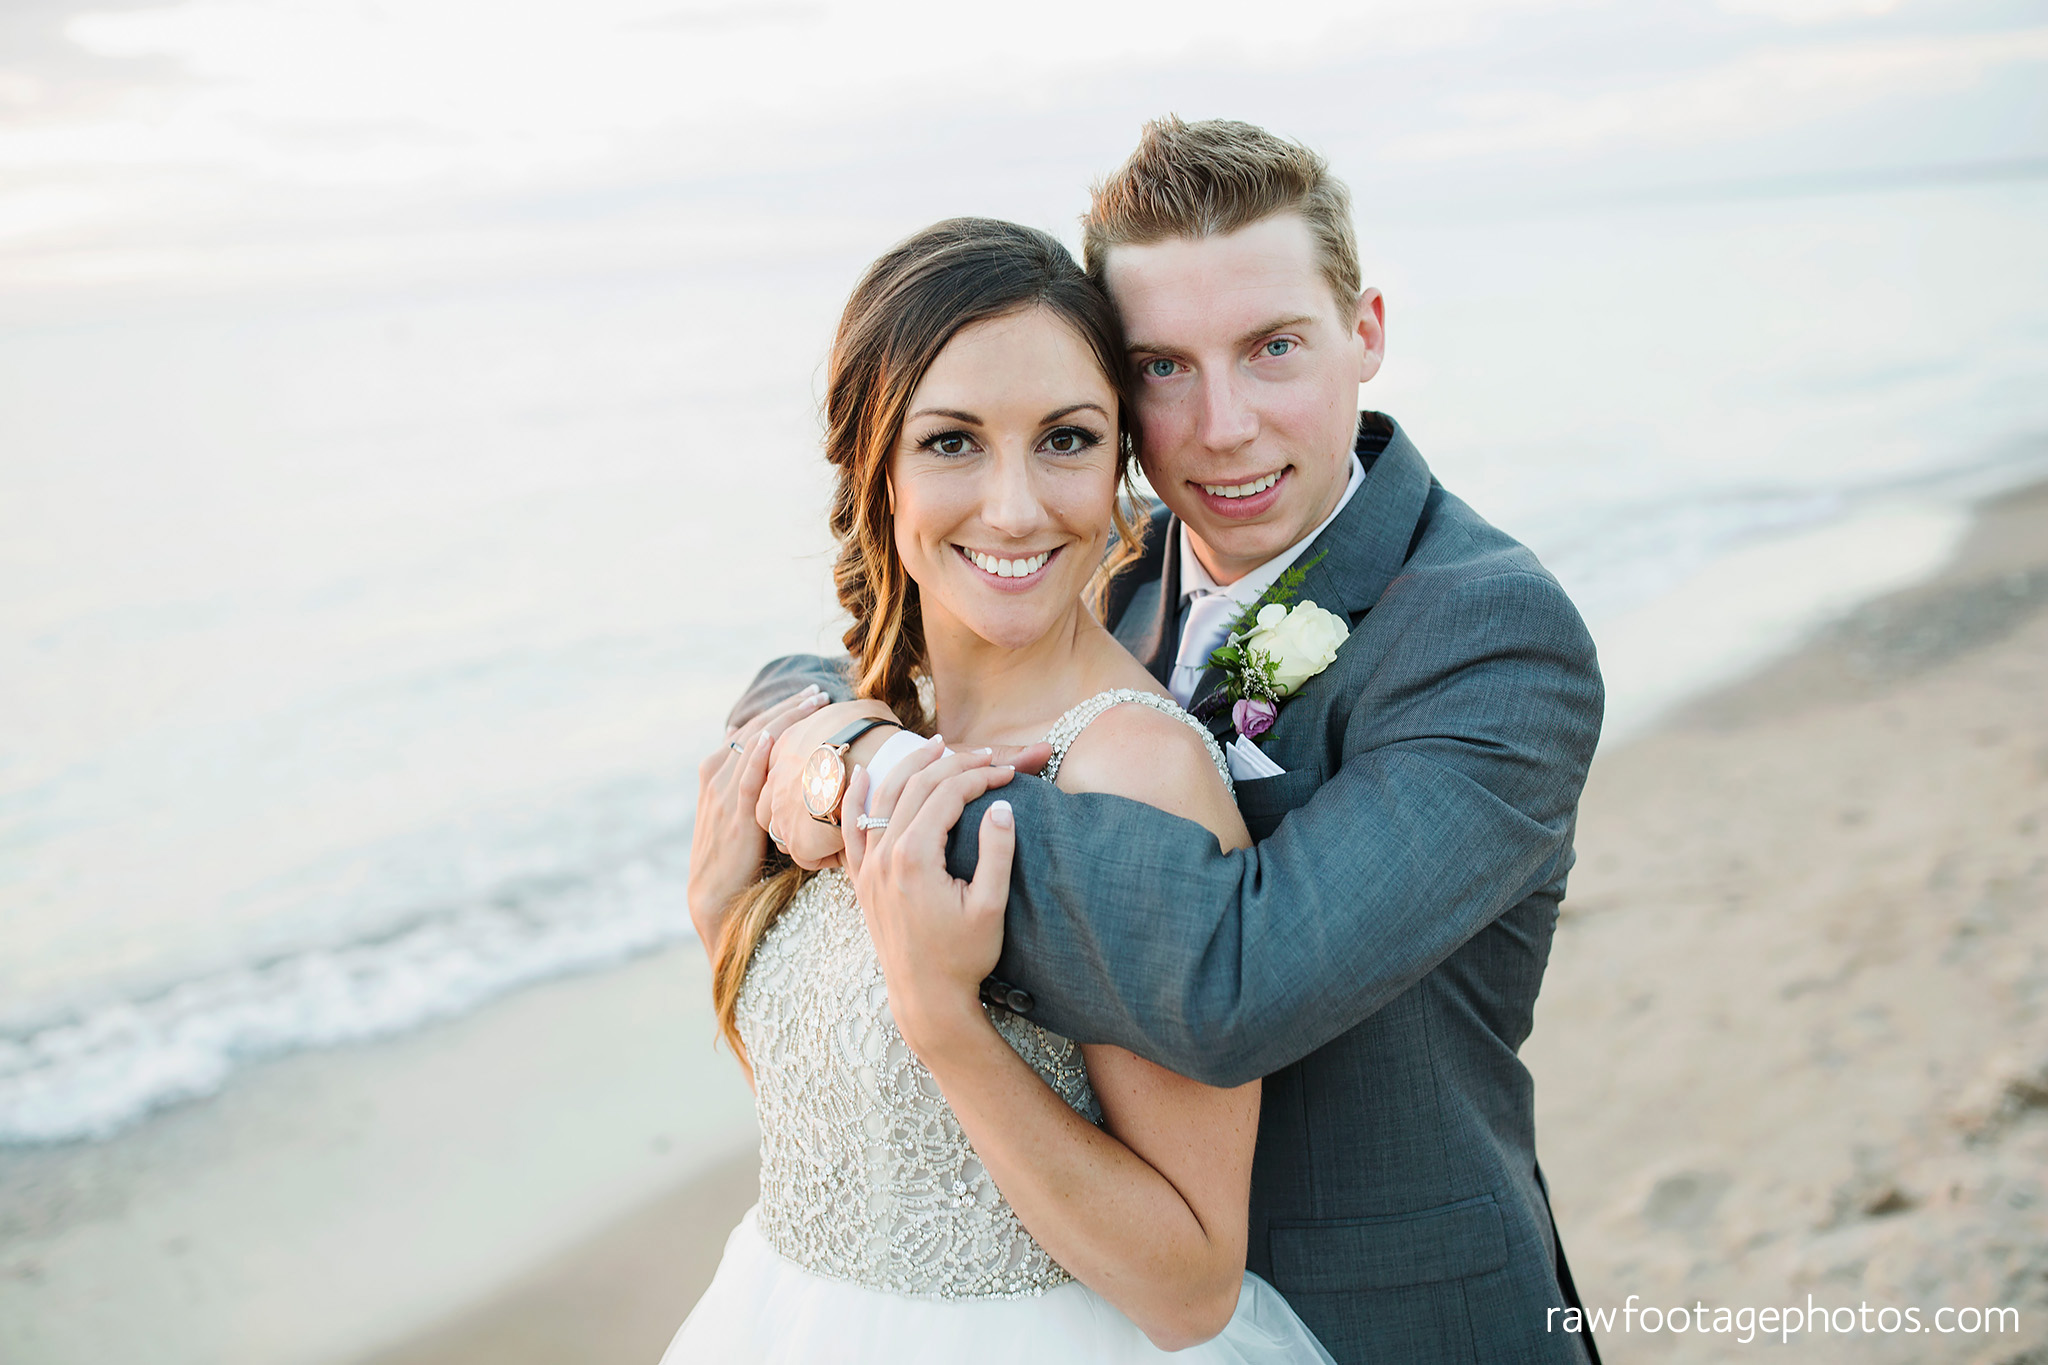 london_ontario_wedding_photographer-grand_bend_wedding_photographer-oakwood_resort_wedding-beach_wedding-sunset_wedding-raw_footage_photography073.jpg